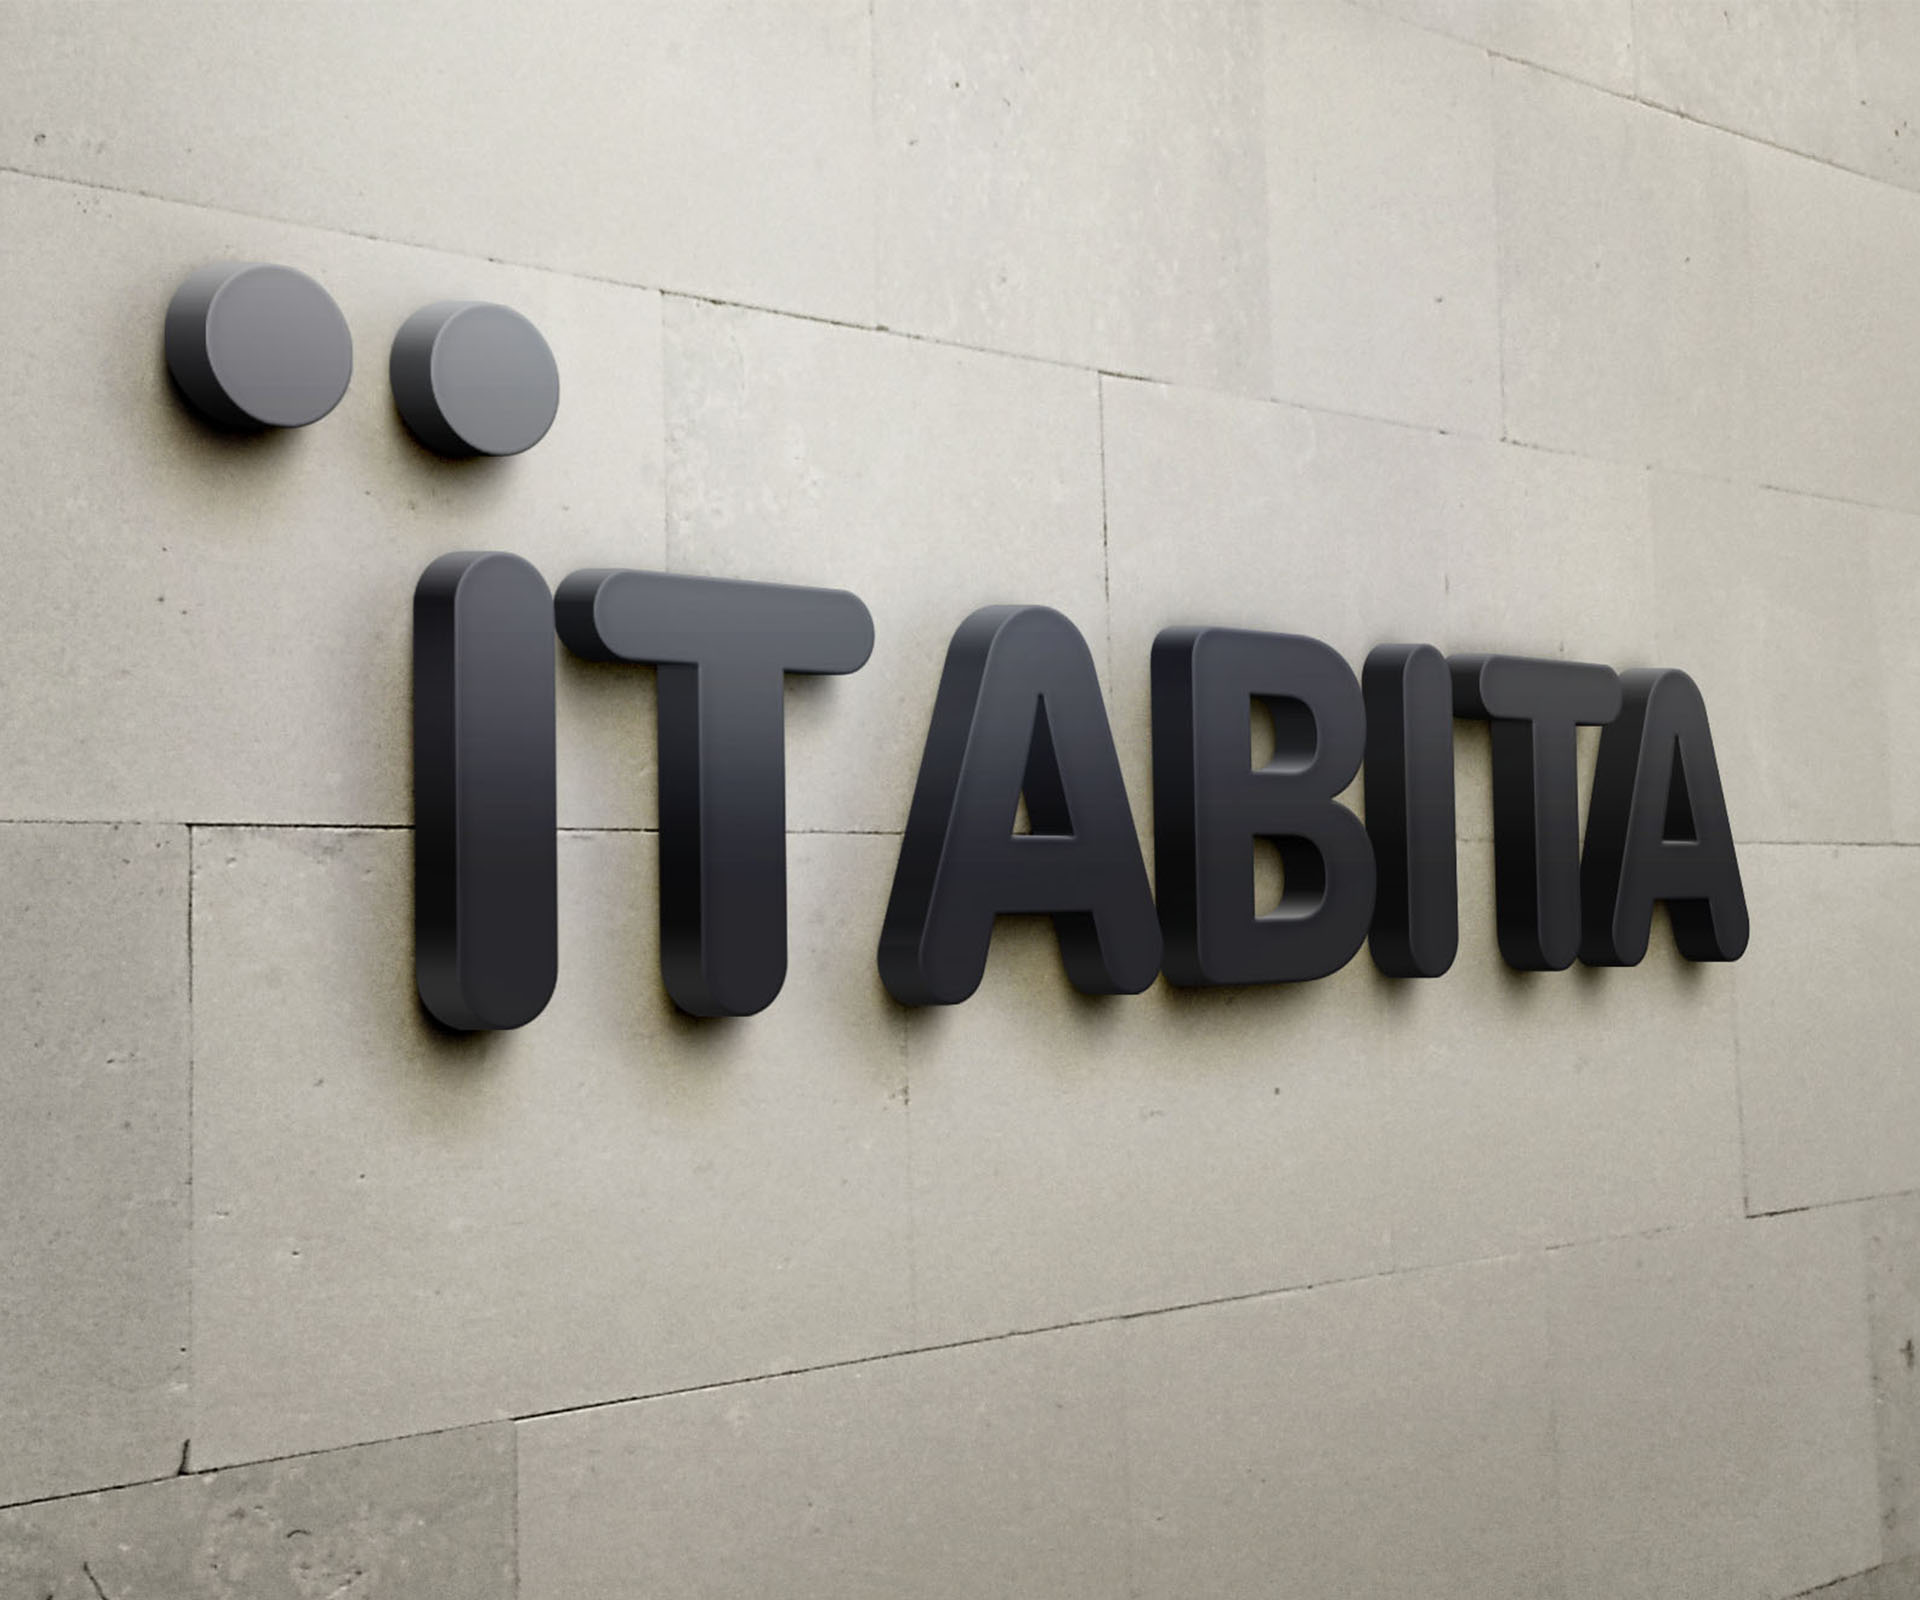 Itabita